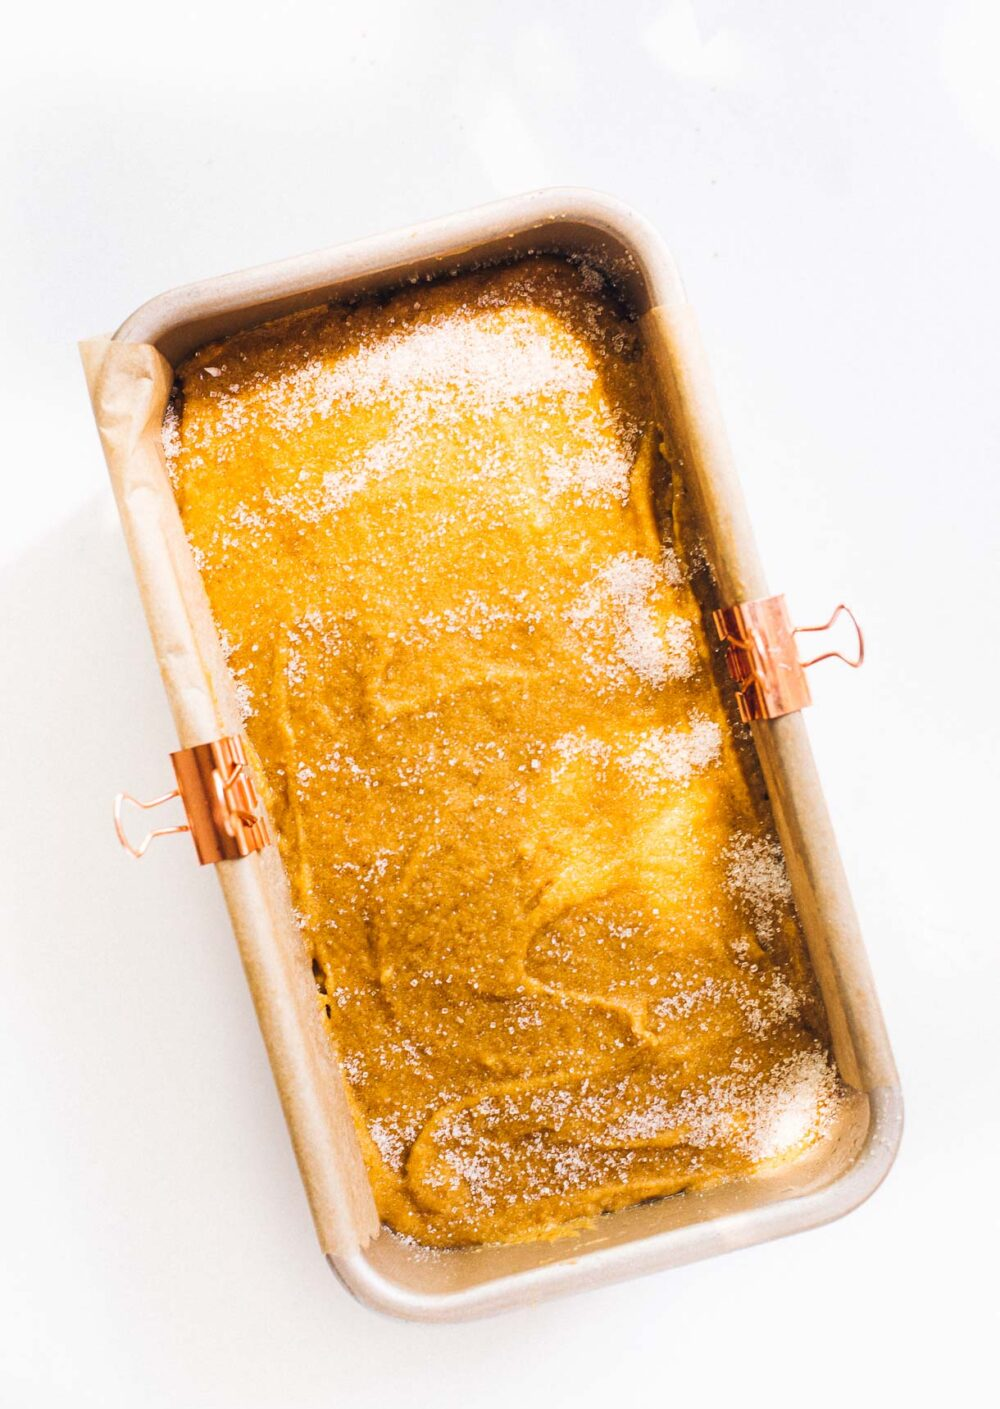 sourdough discard pumpkin bread in a loaf pan before baking